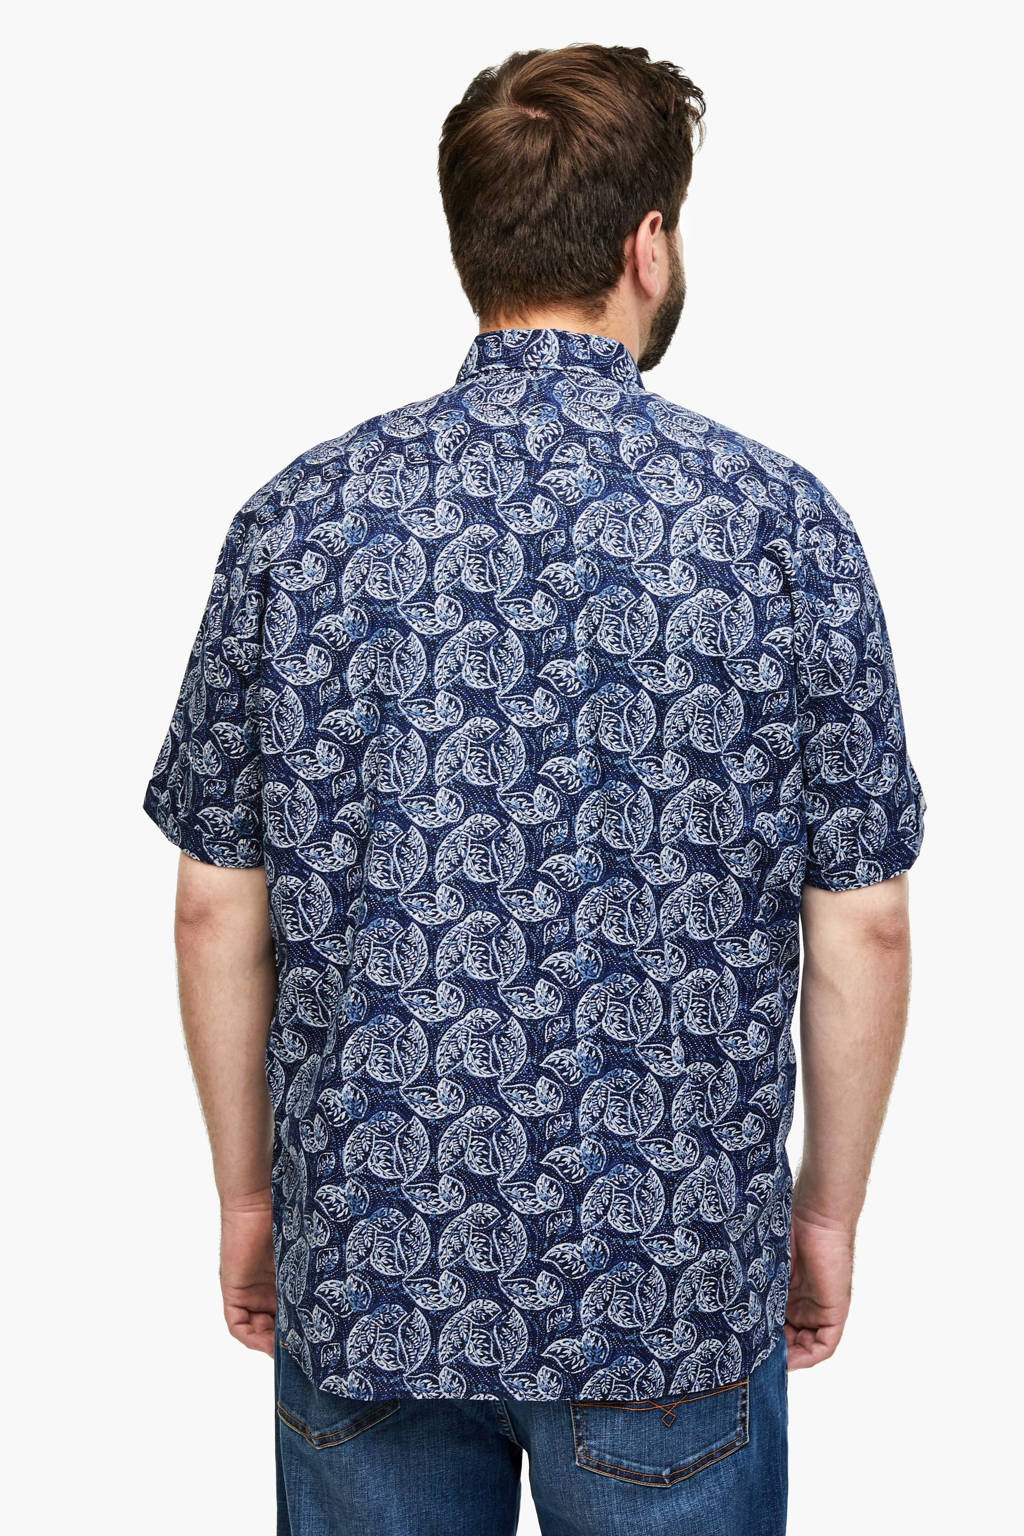 s.Oliver regular fit overhemd met all over print donkerblauw, Donkerblauw